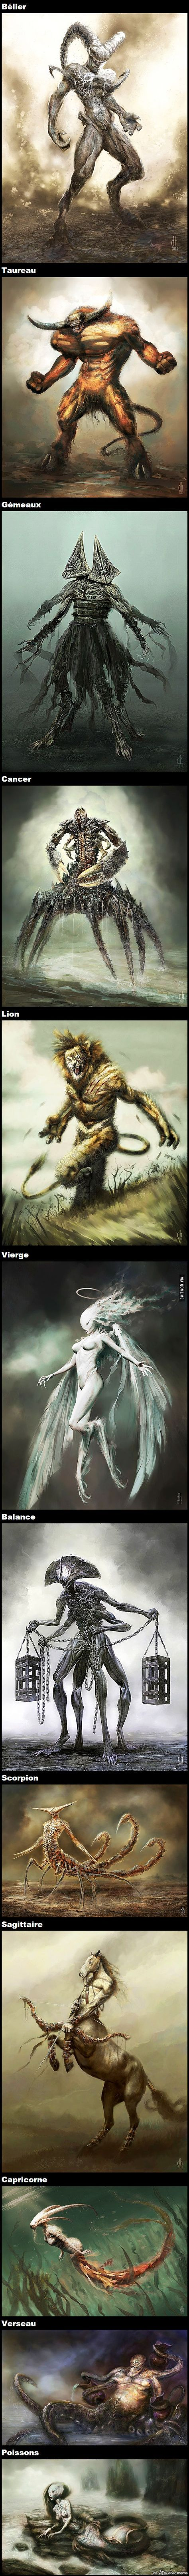 Les 12 signes du Zodiaque en Monstres Terrifiants – Québec Meme +